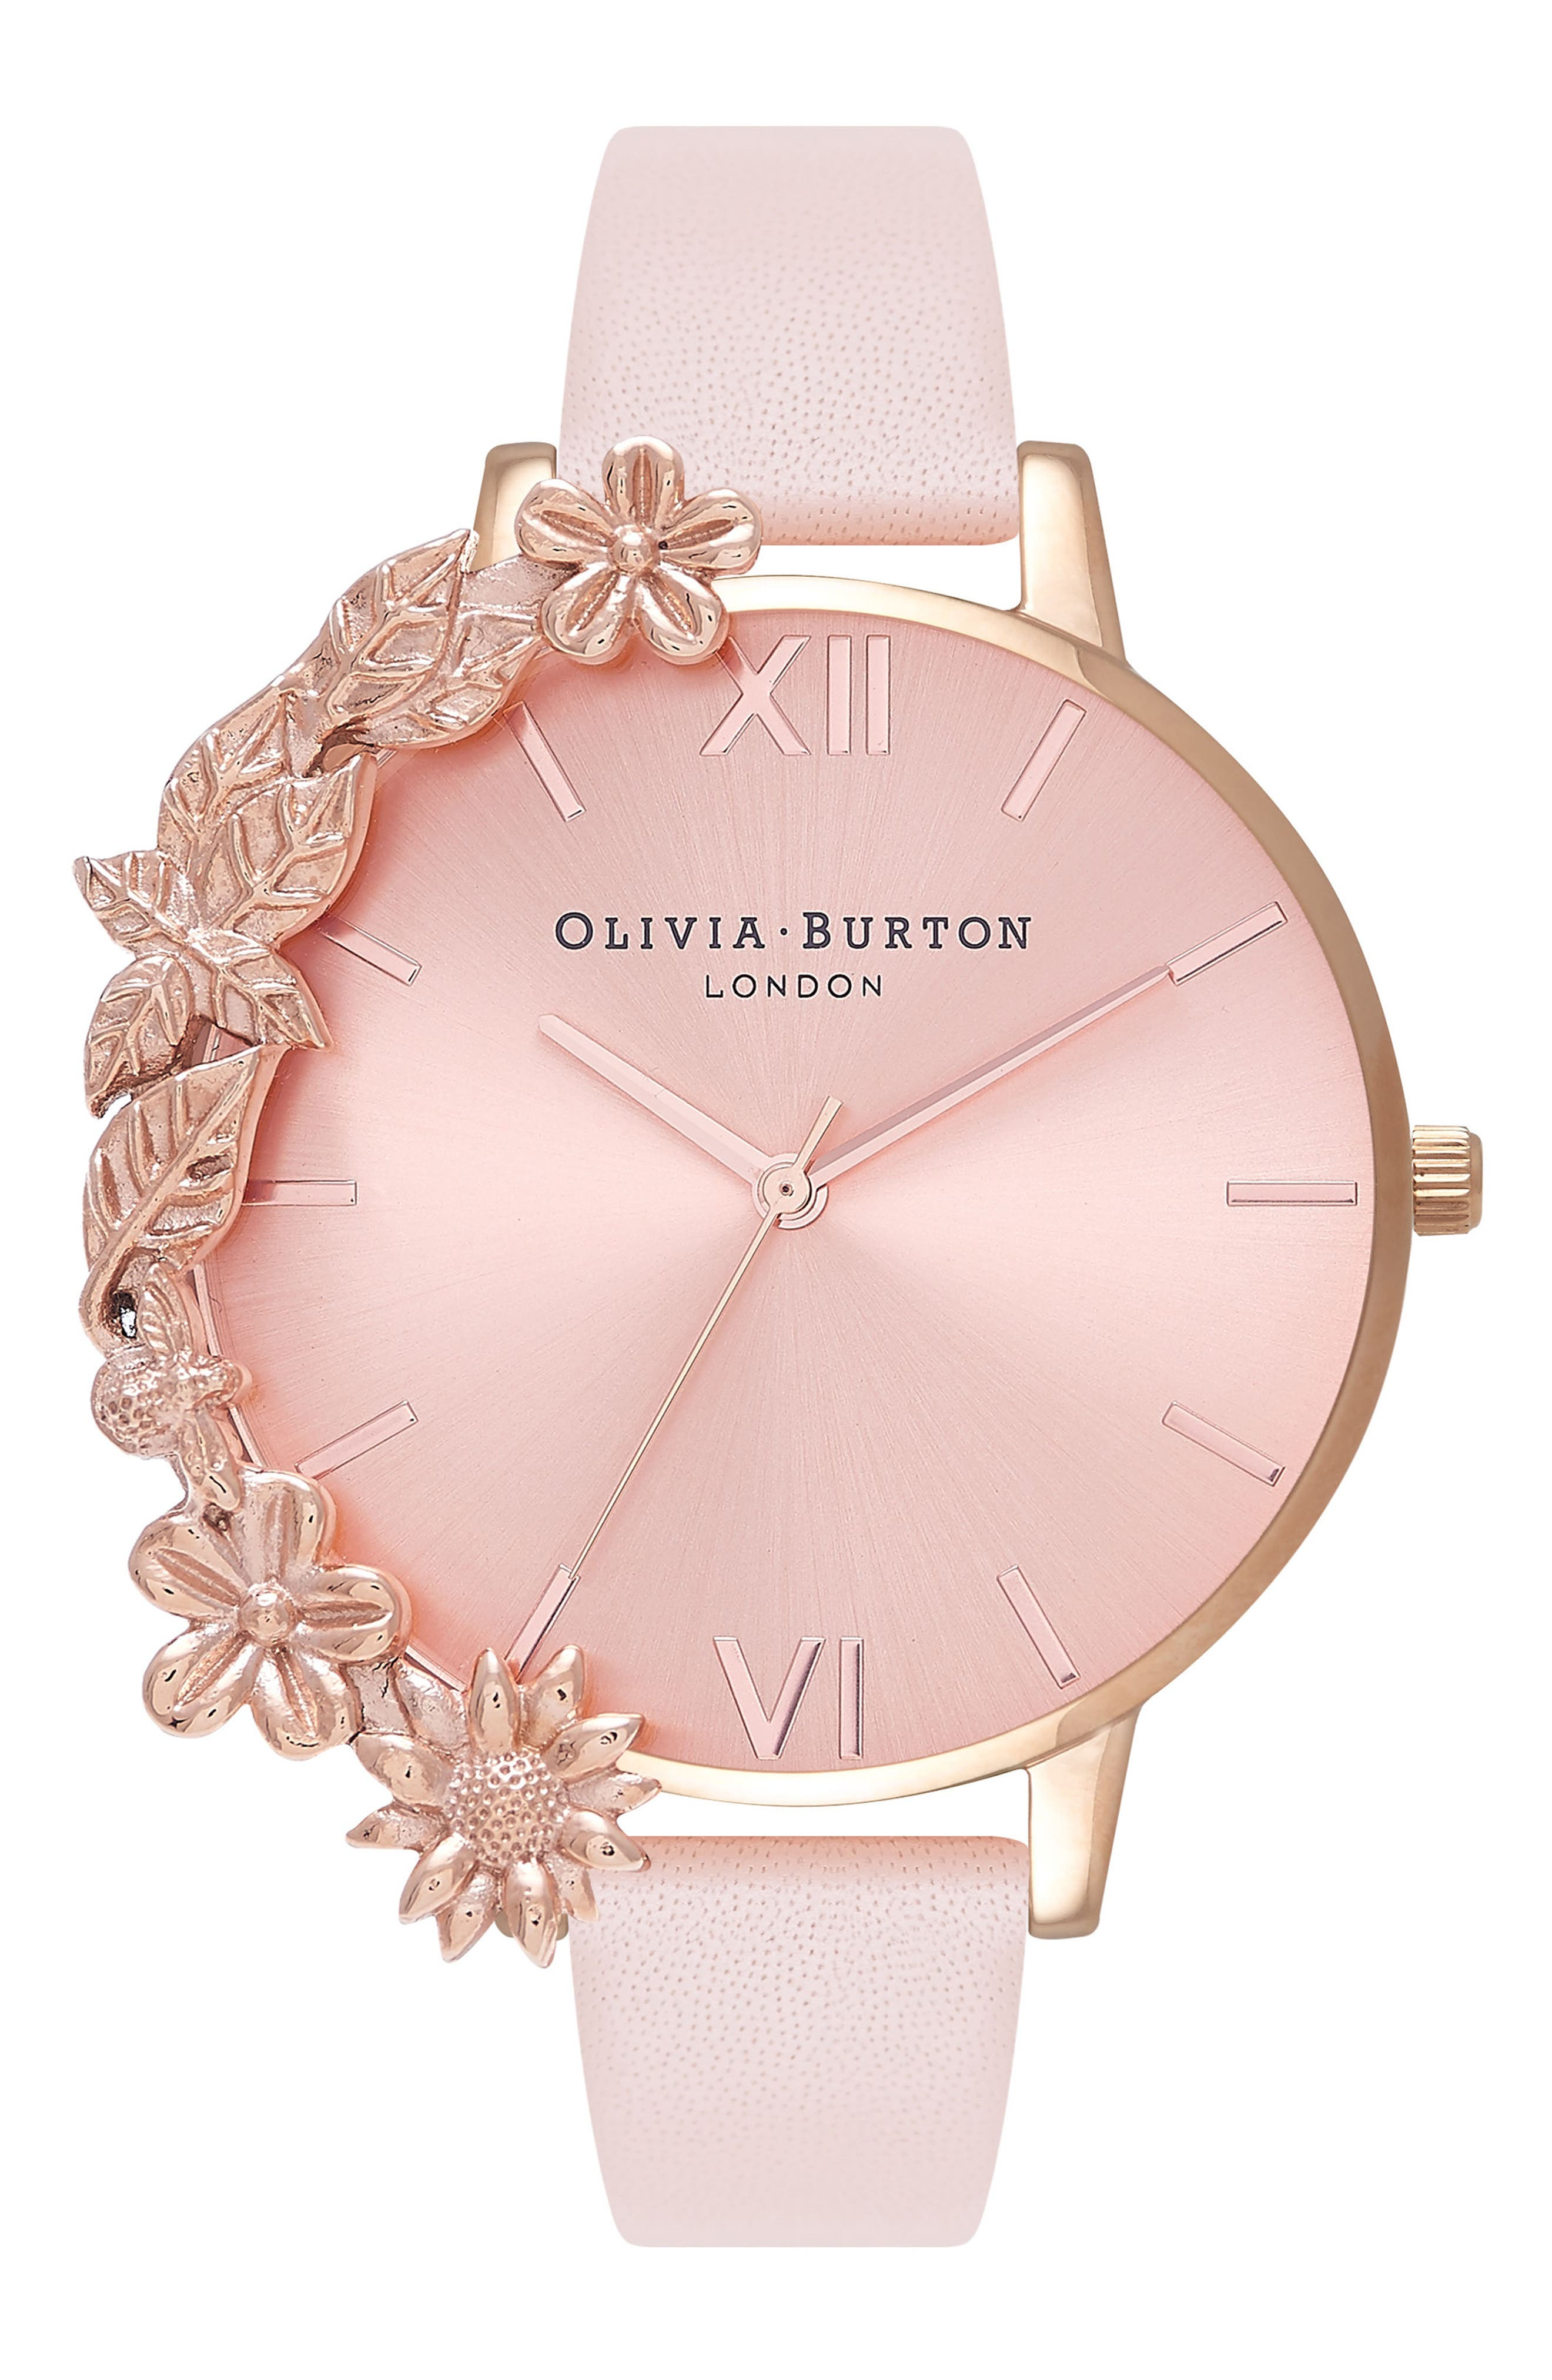 Main Image - Olivia Burton Case Cuff Leather Strap Watch, 38mm (Nordstrom Exclusive)